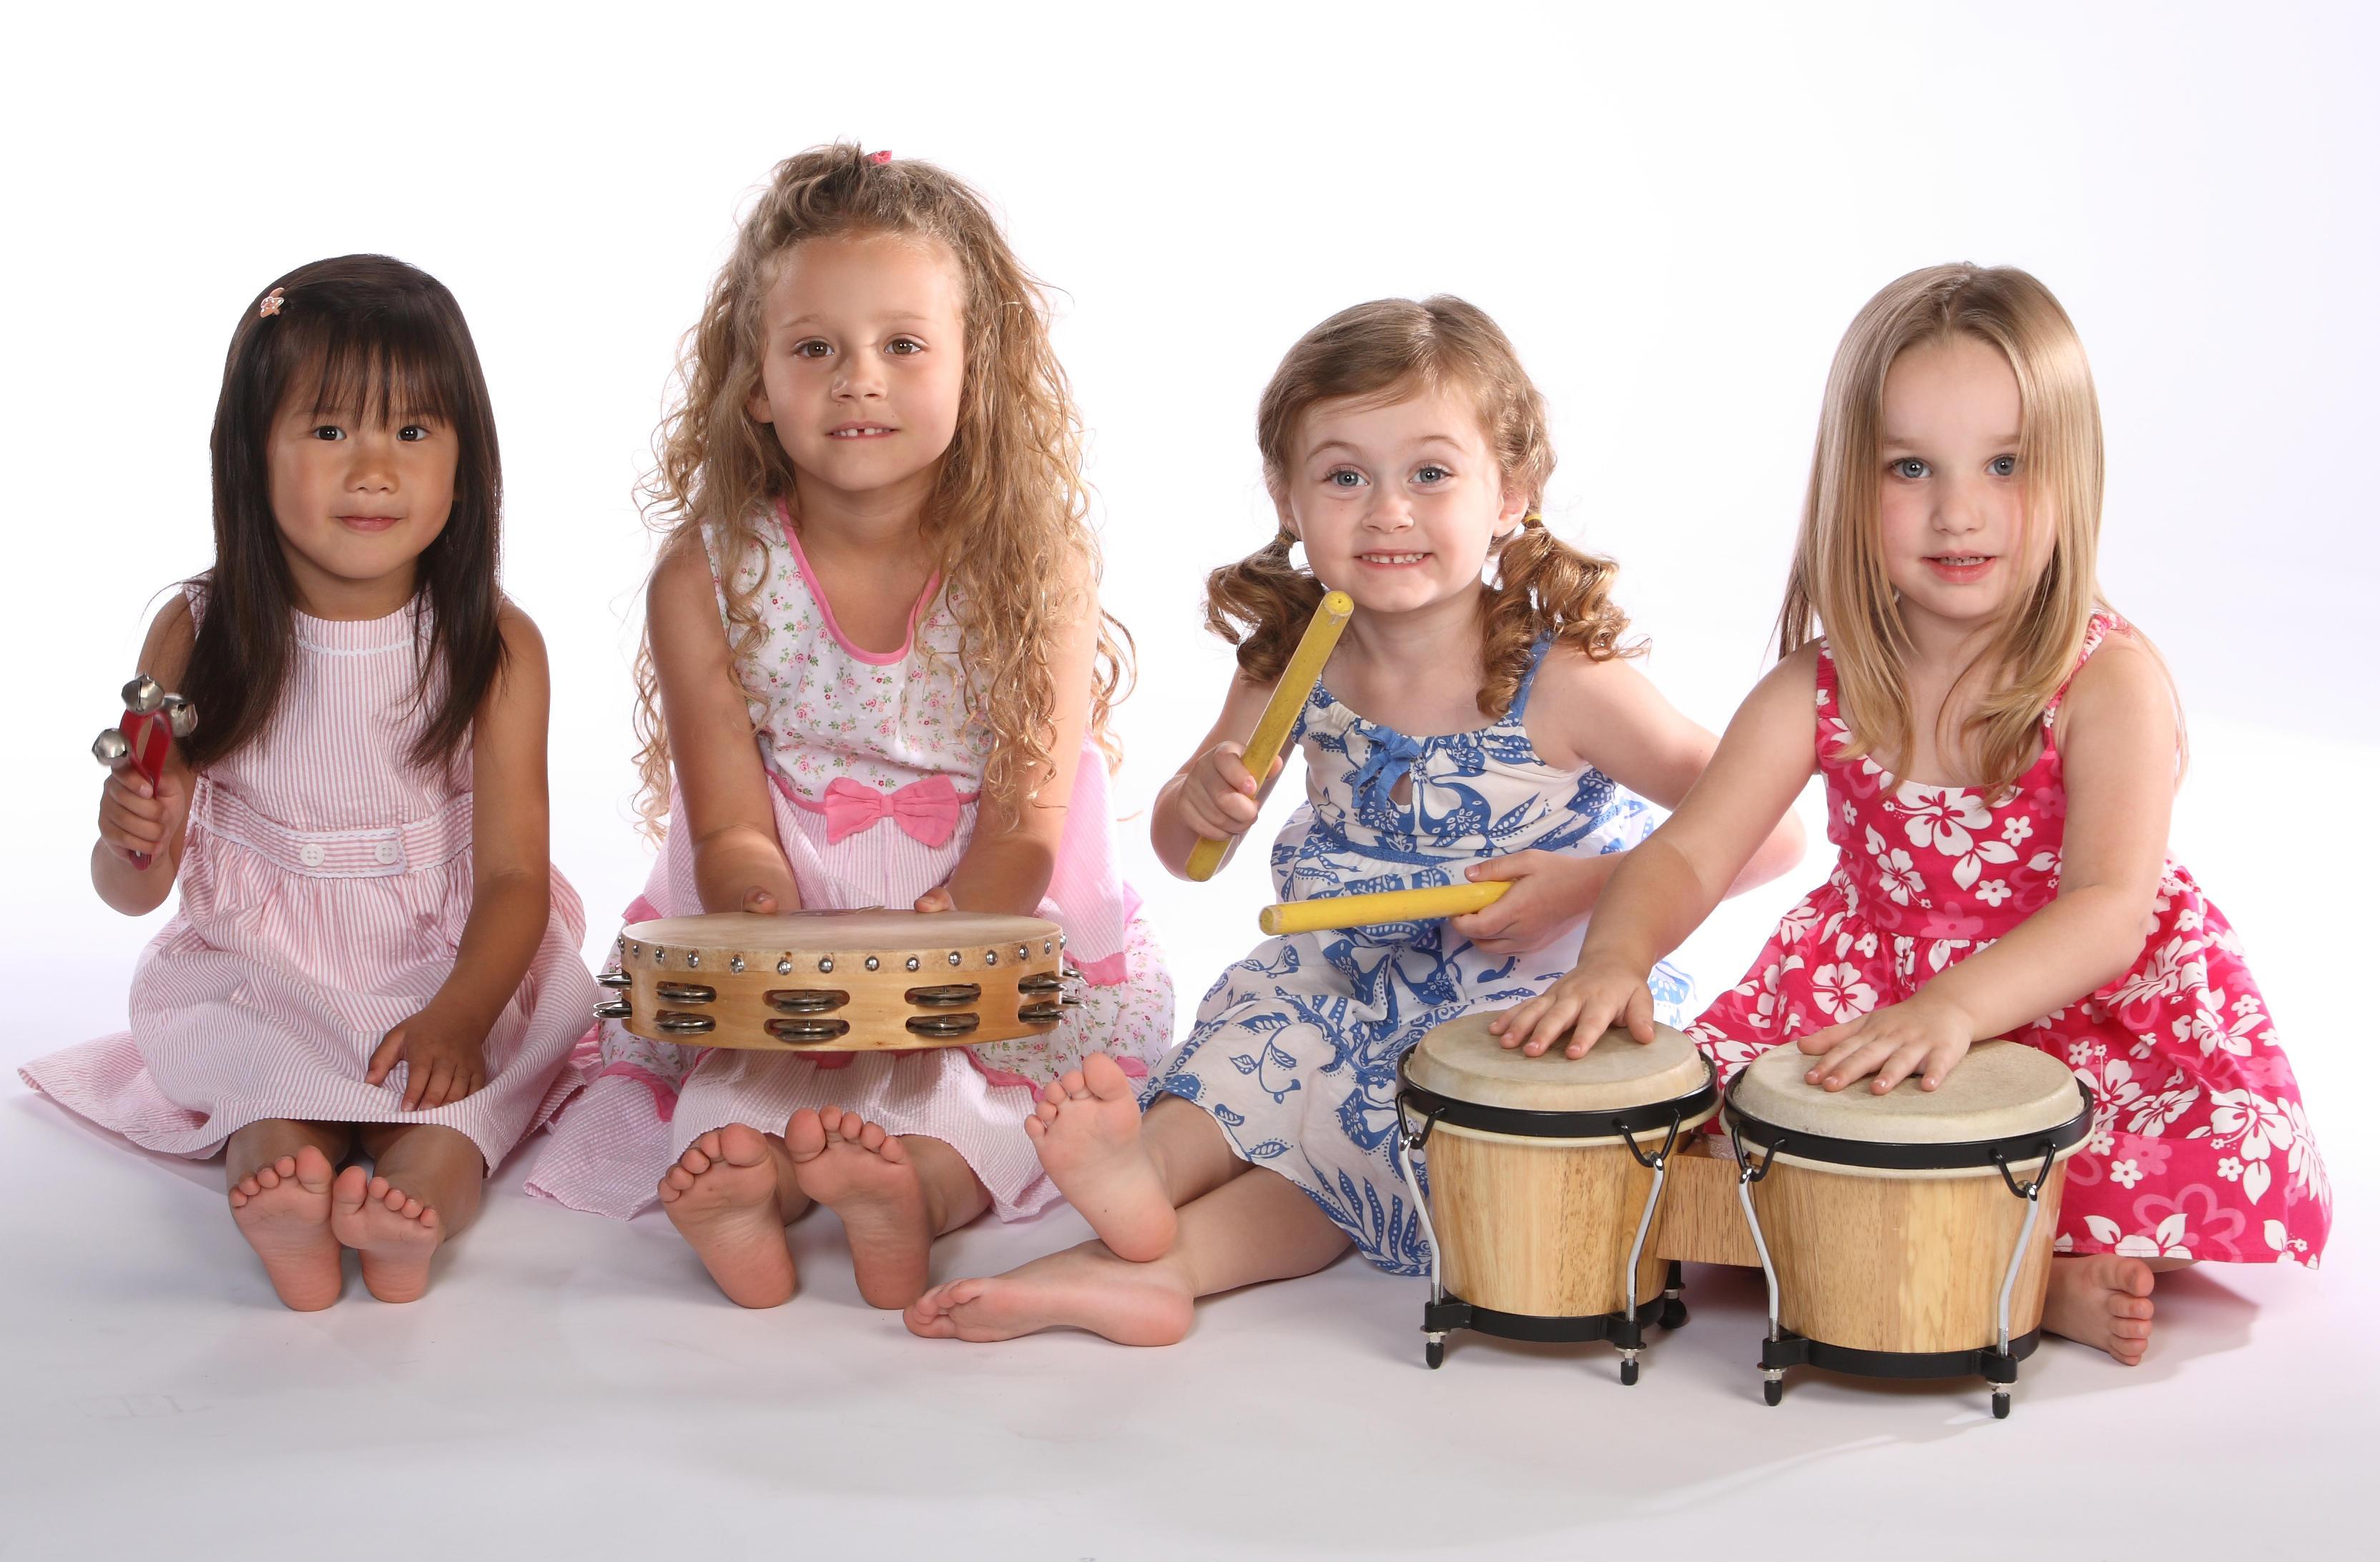 Murrieta Academy of Music & Performing Arts image 2